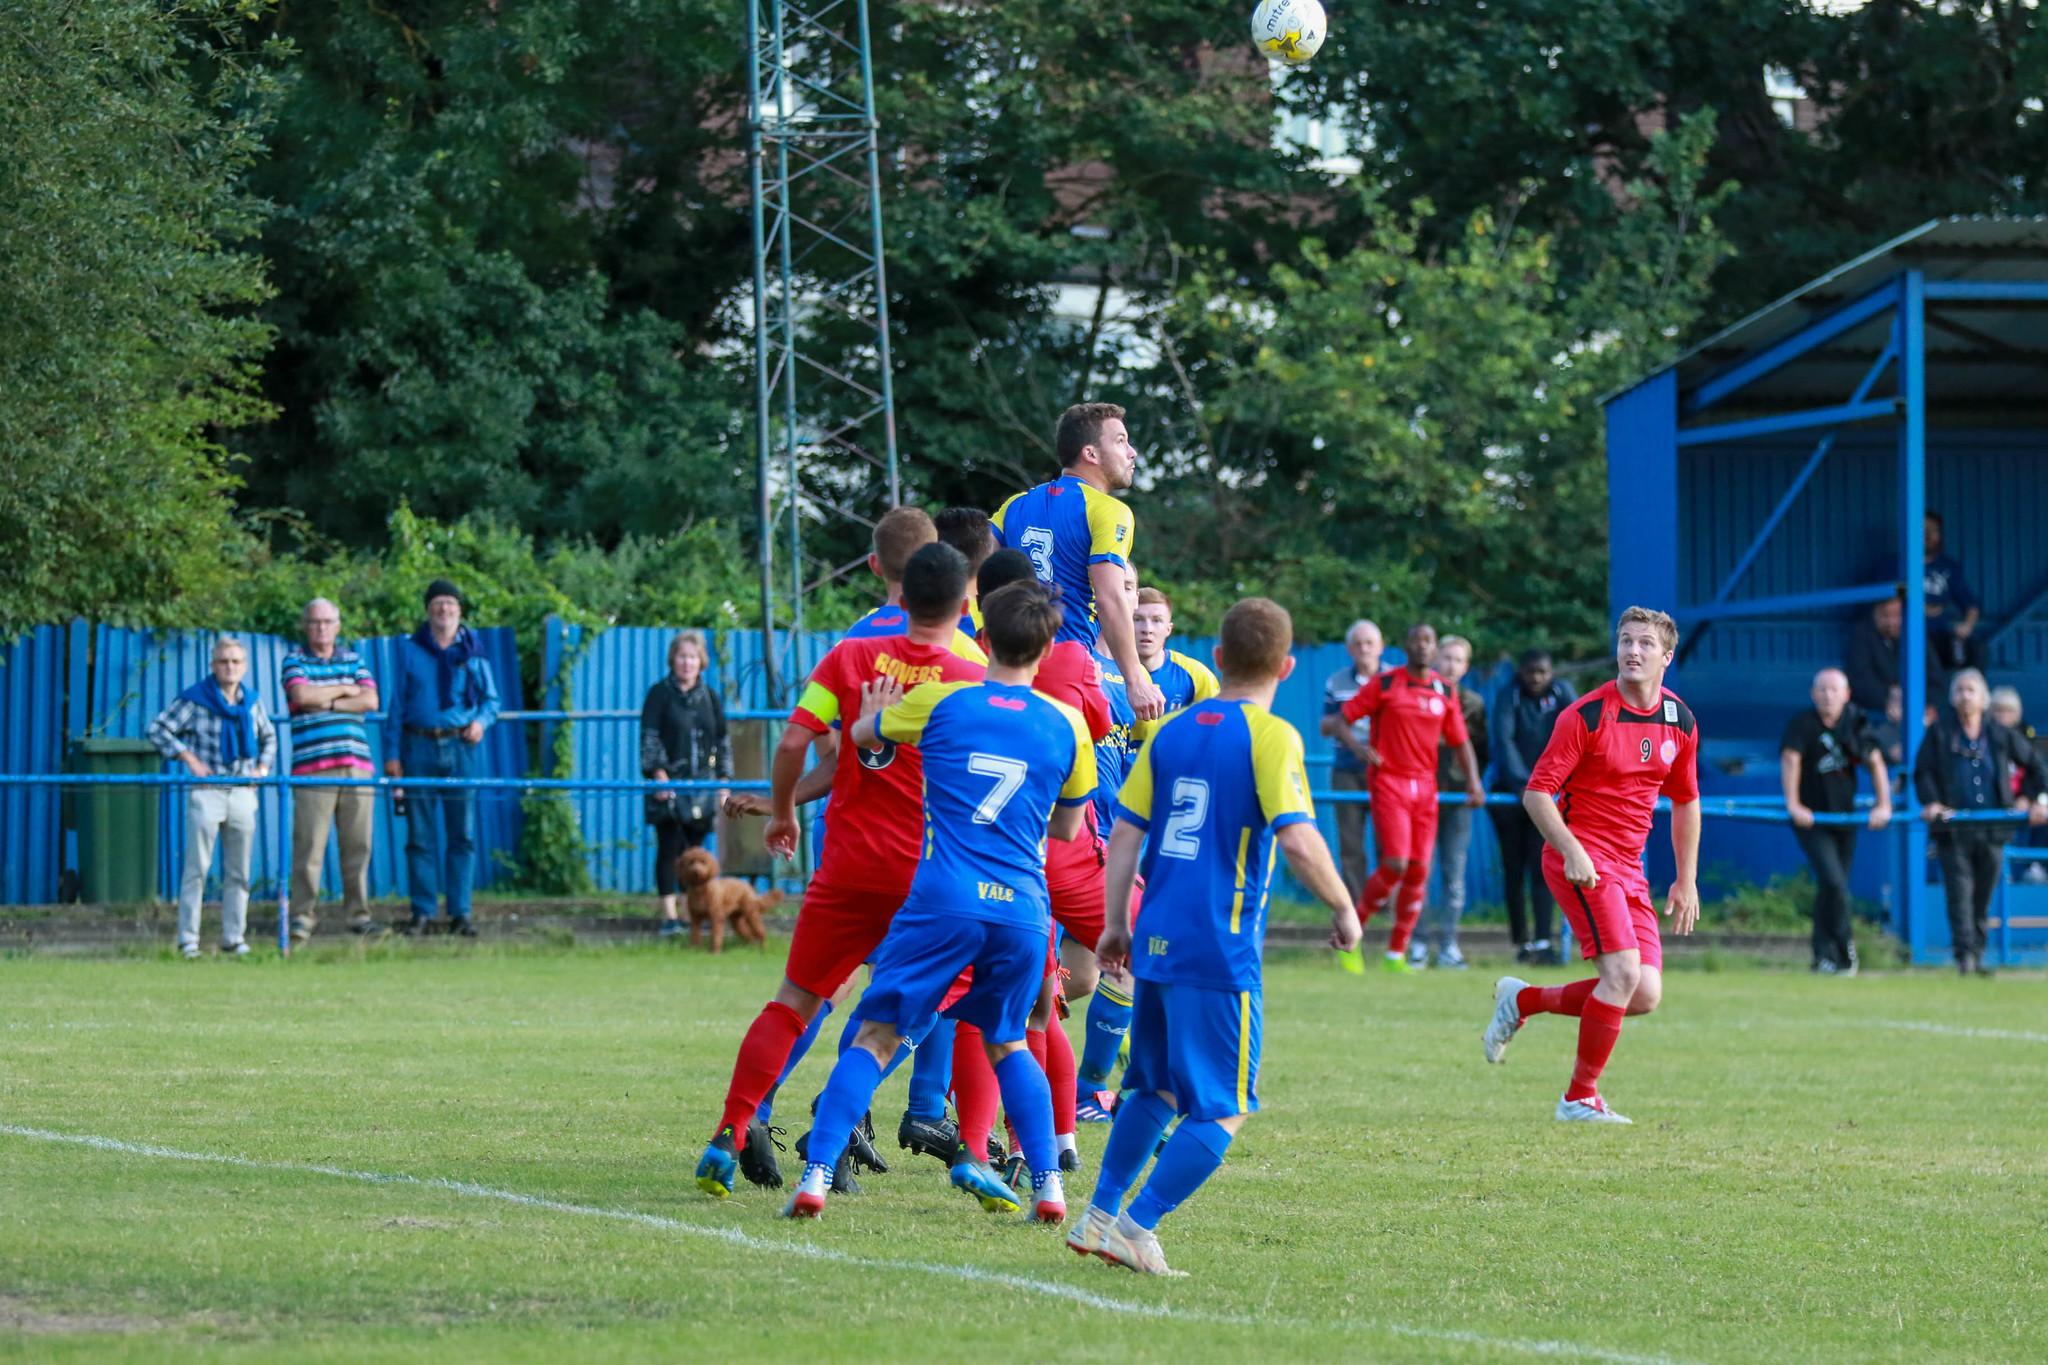 Raynes Park Vale Football Club